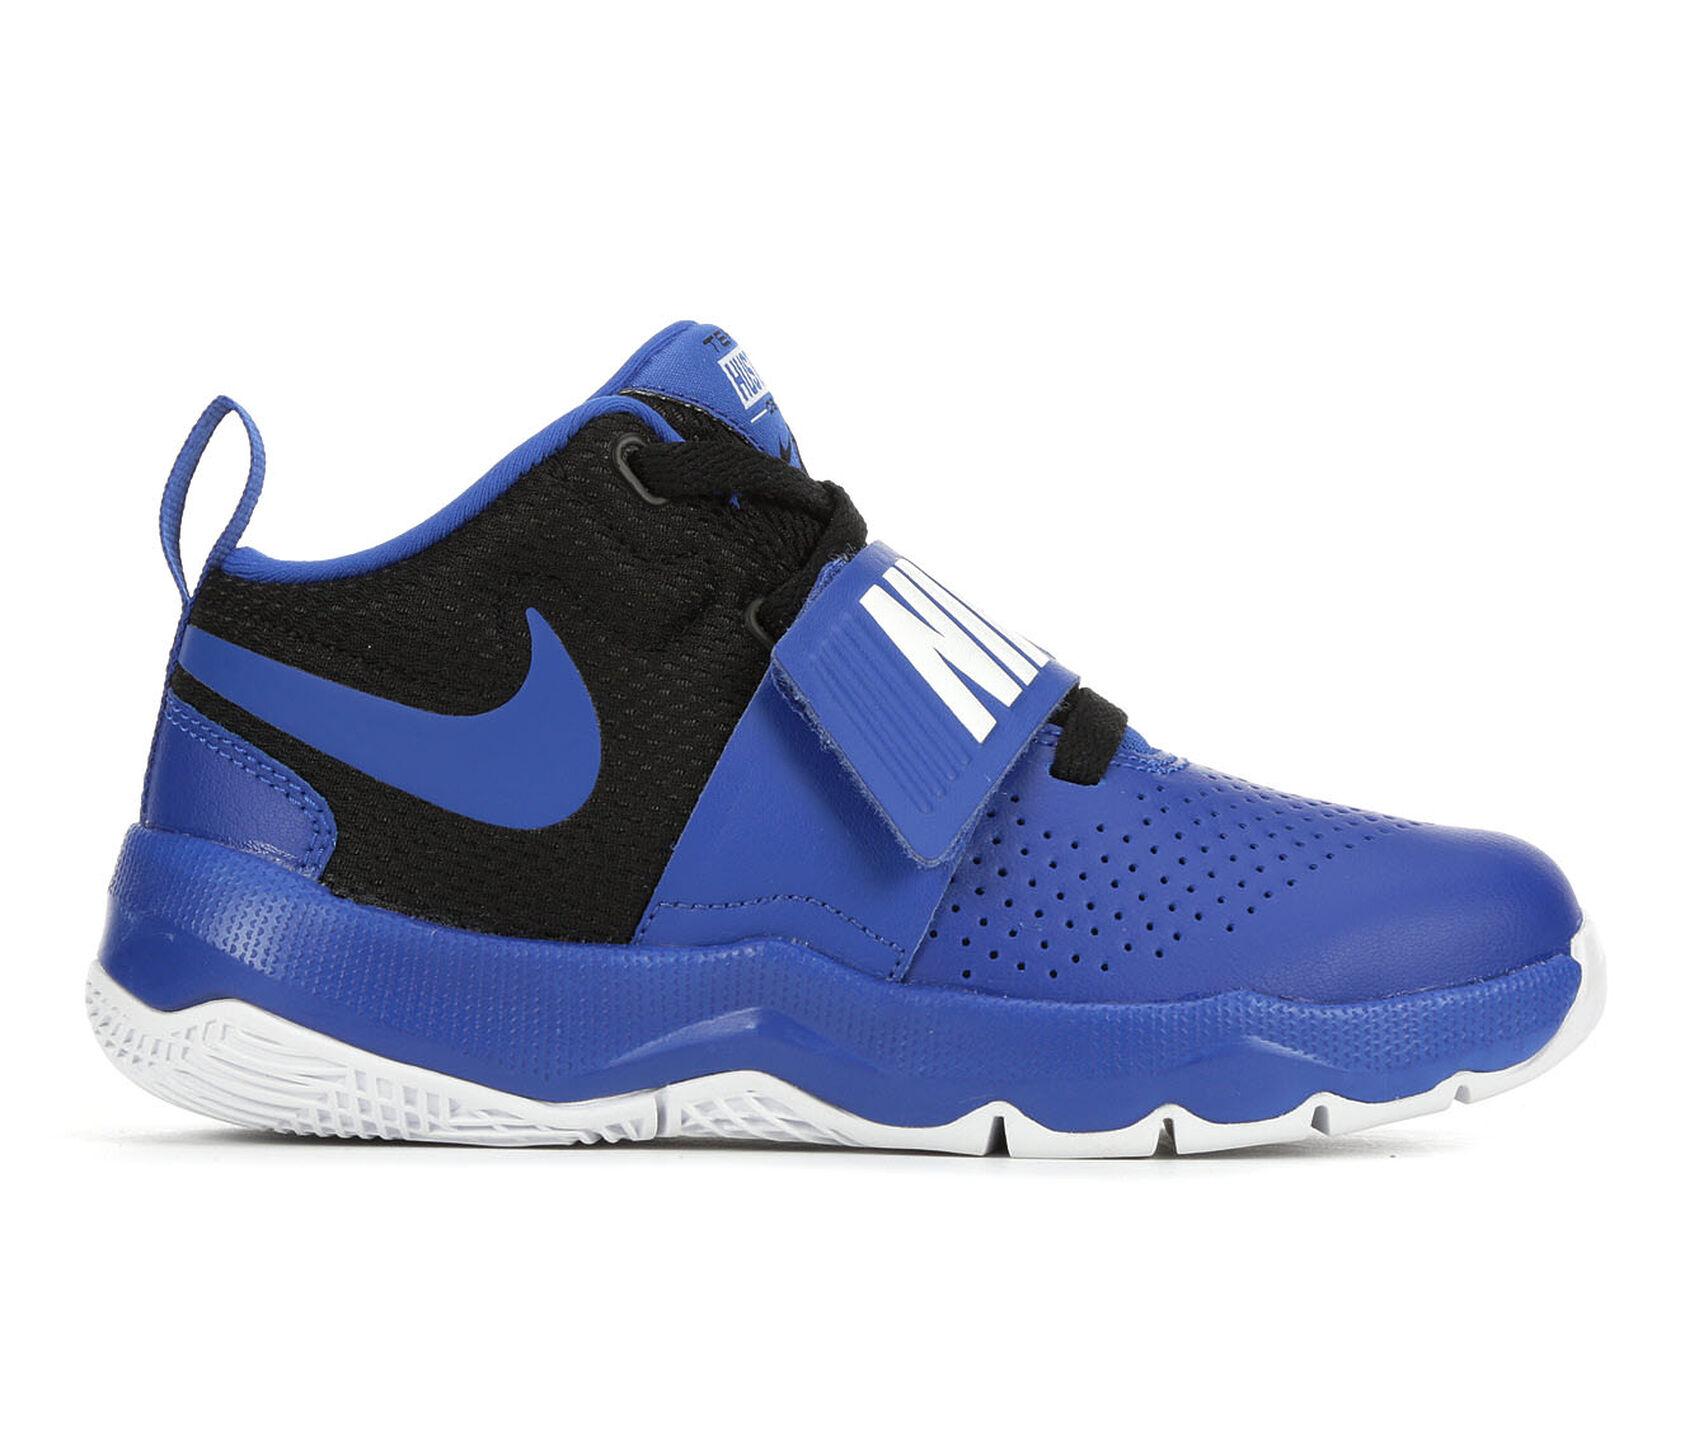 newest 49b57 c6c47 Boys  Nike Little Kid Team Hustle D8 High Top Basketball Shoes   Shoe  Carnival